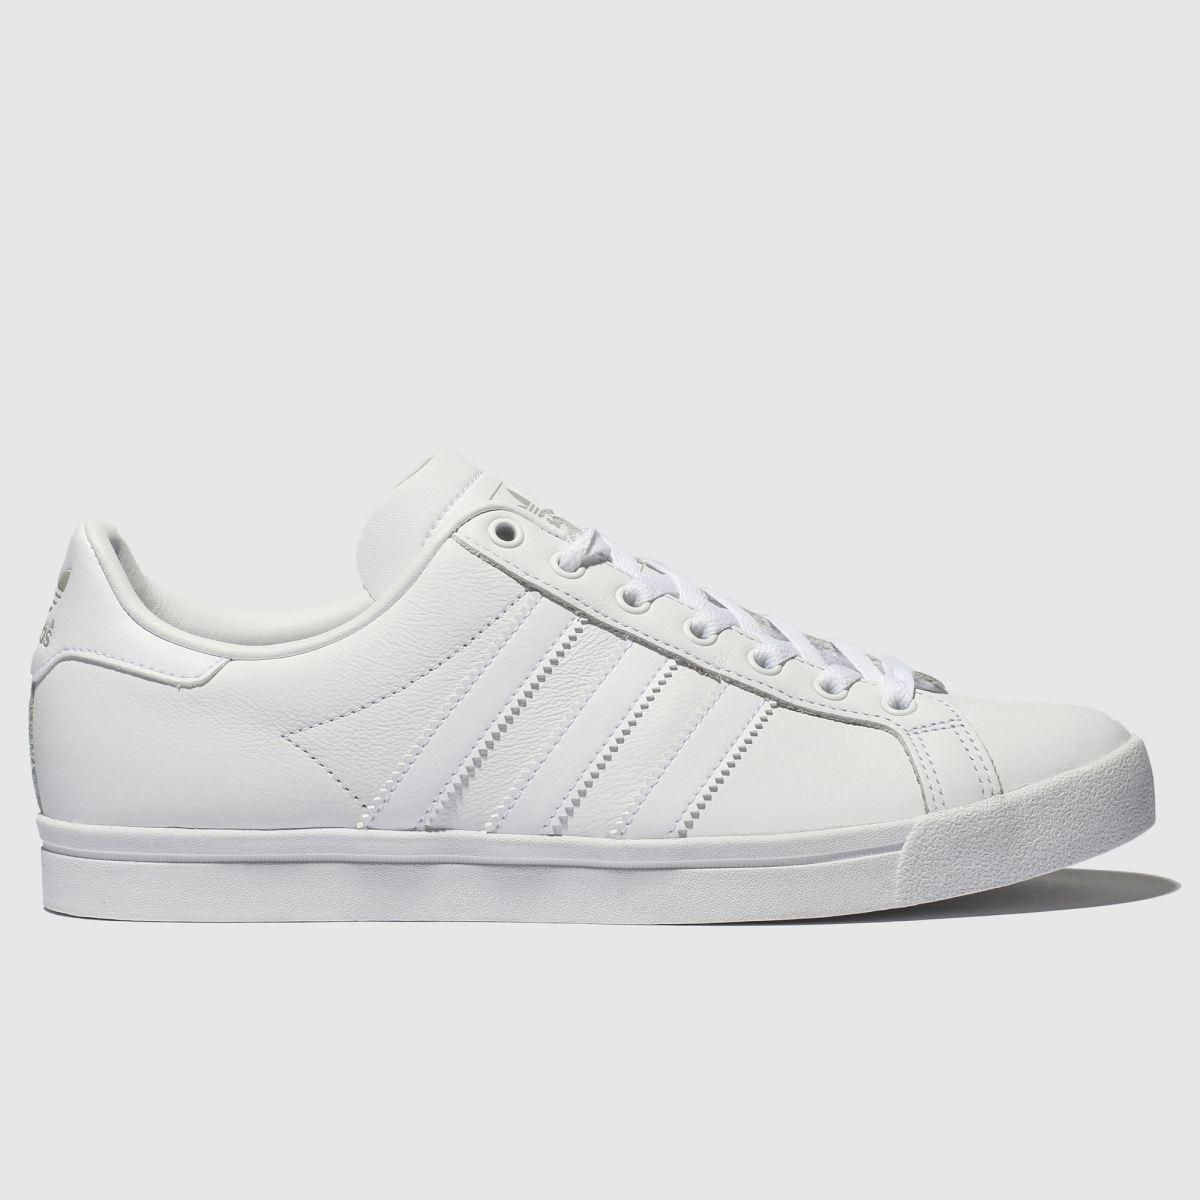 Adidas White & Grey Coast Star Trainers